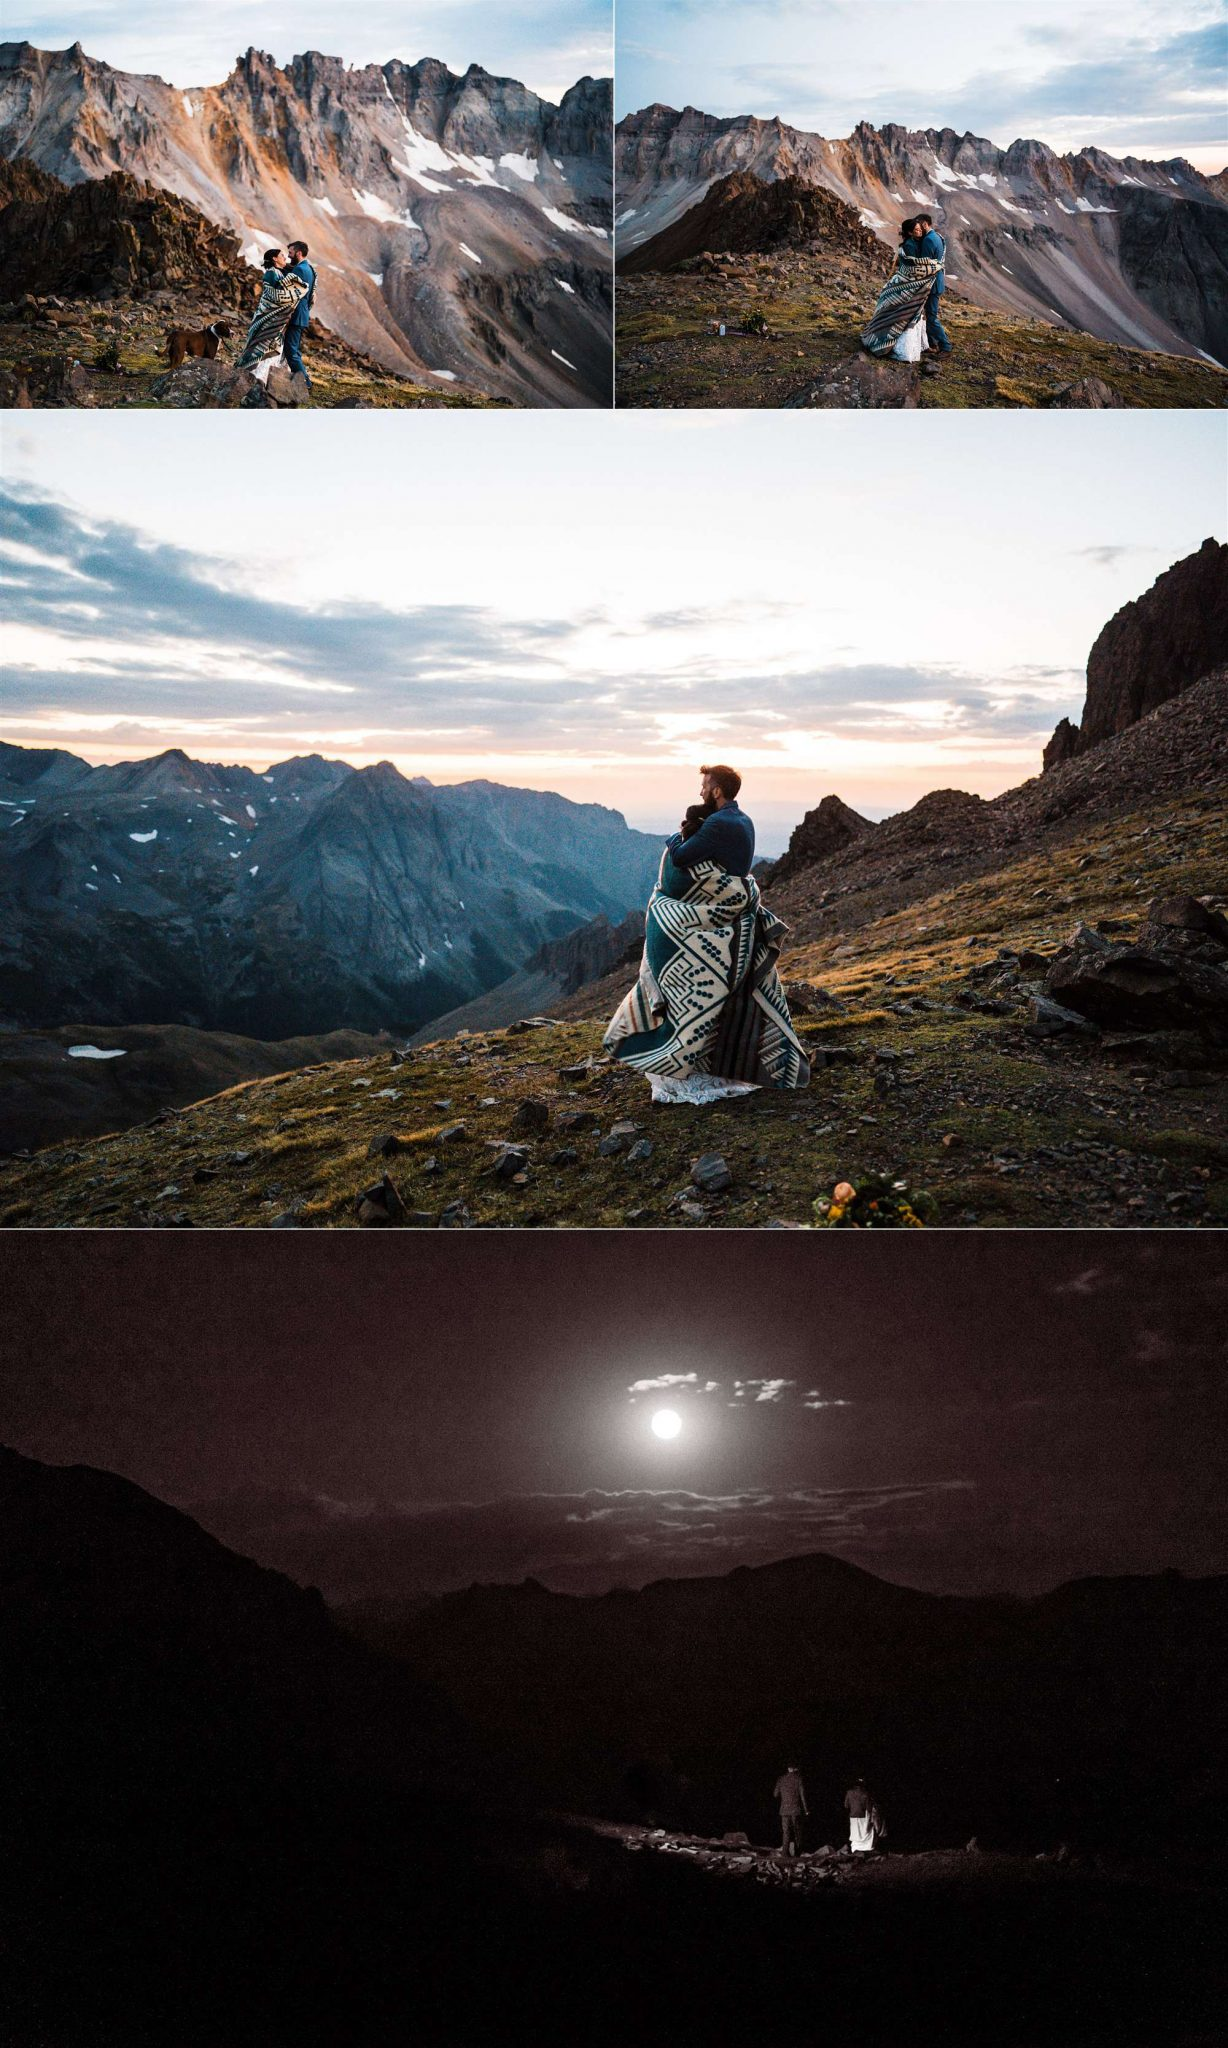 Colorado_Jeeping_Elopement_Emily_Matt_The_Foxes_Photography_0052.jpg